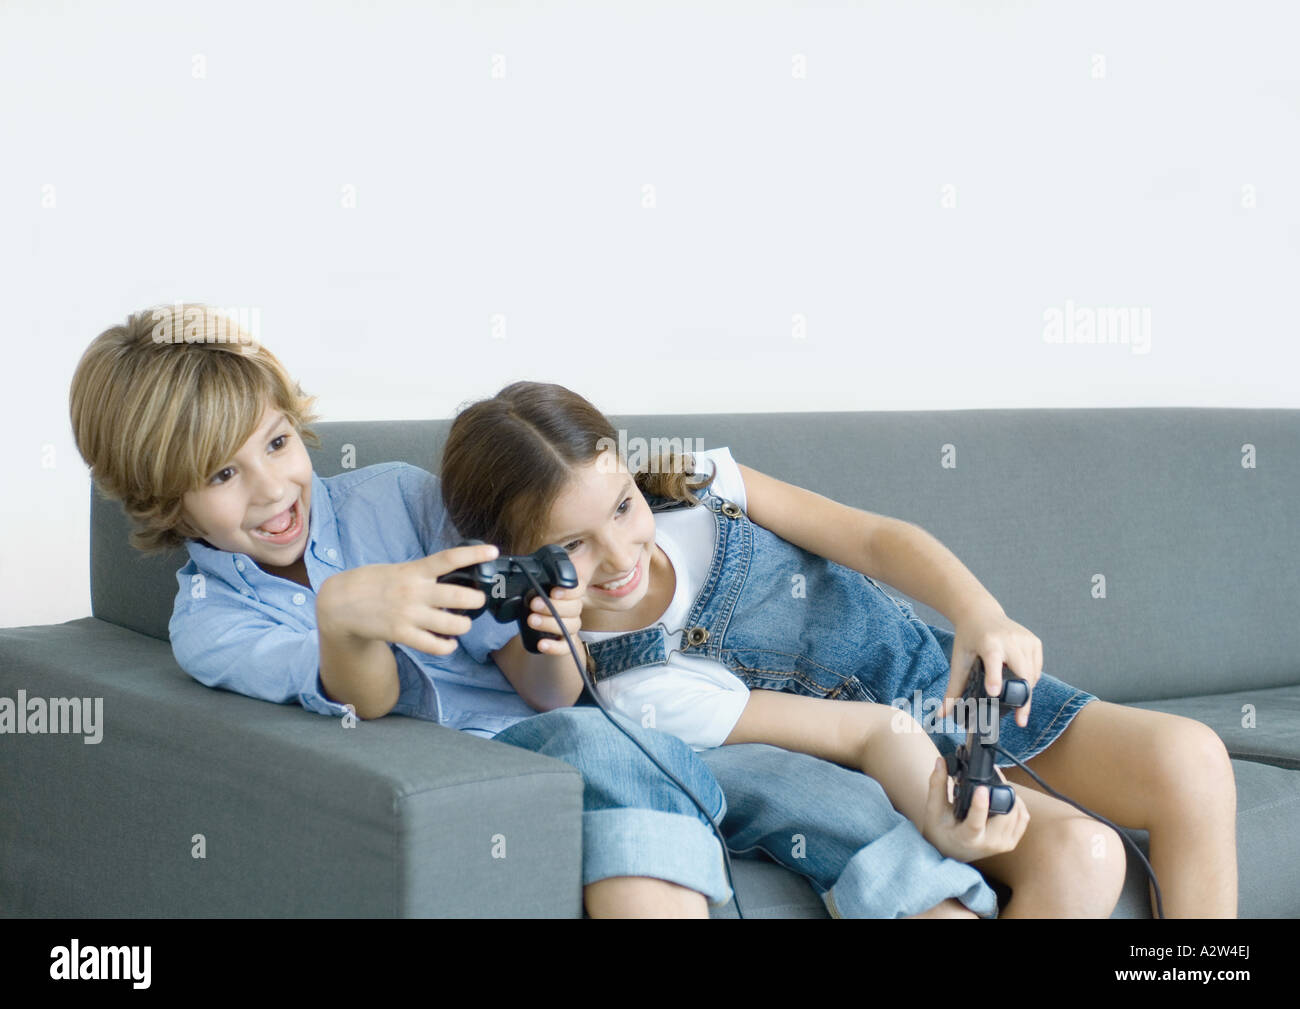 Children sitting on sofa, holding joysticks - Stock Image